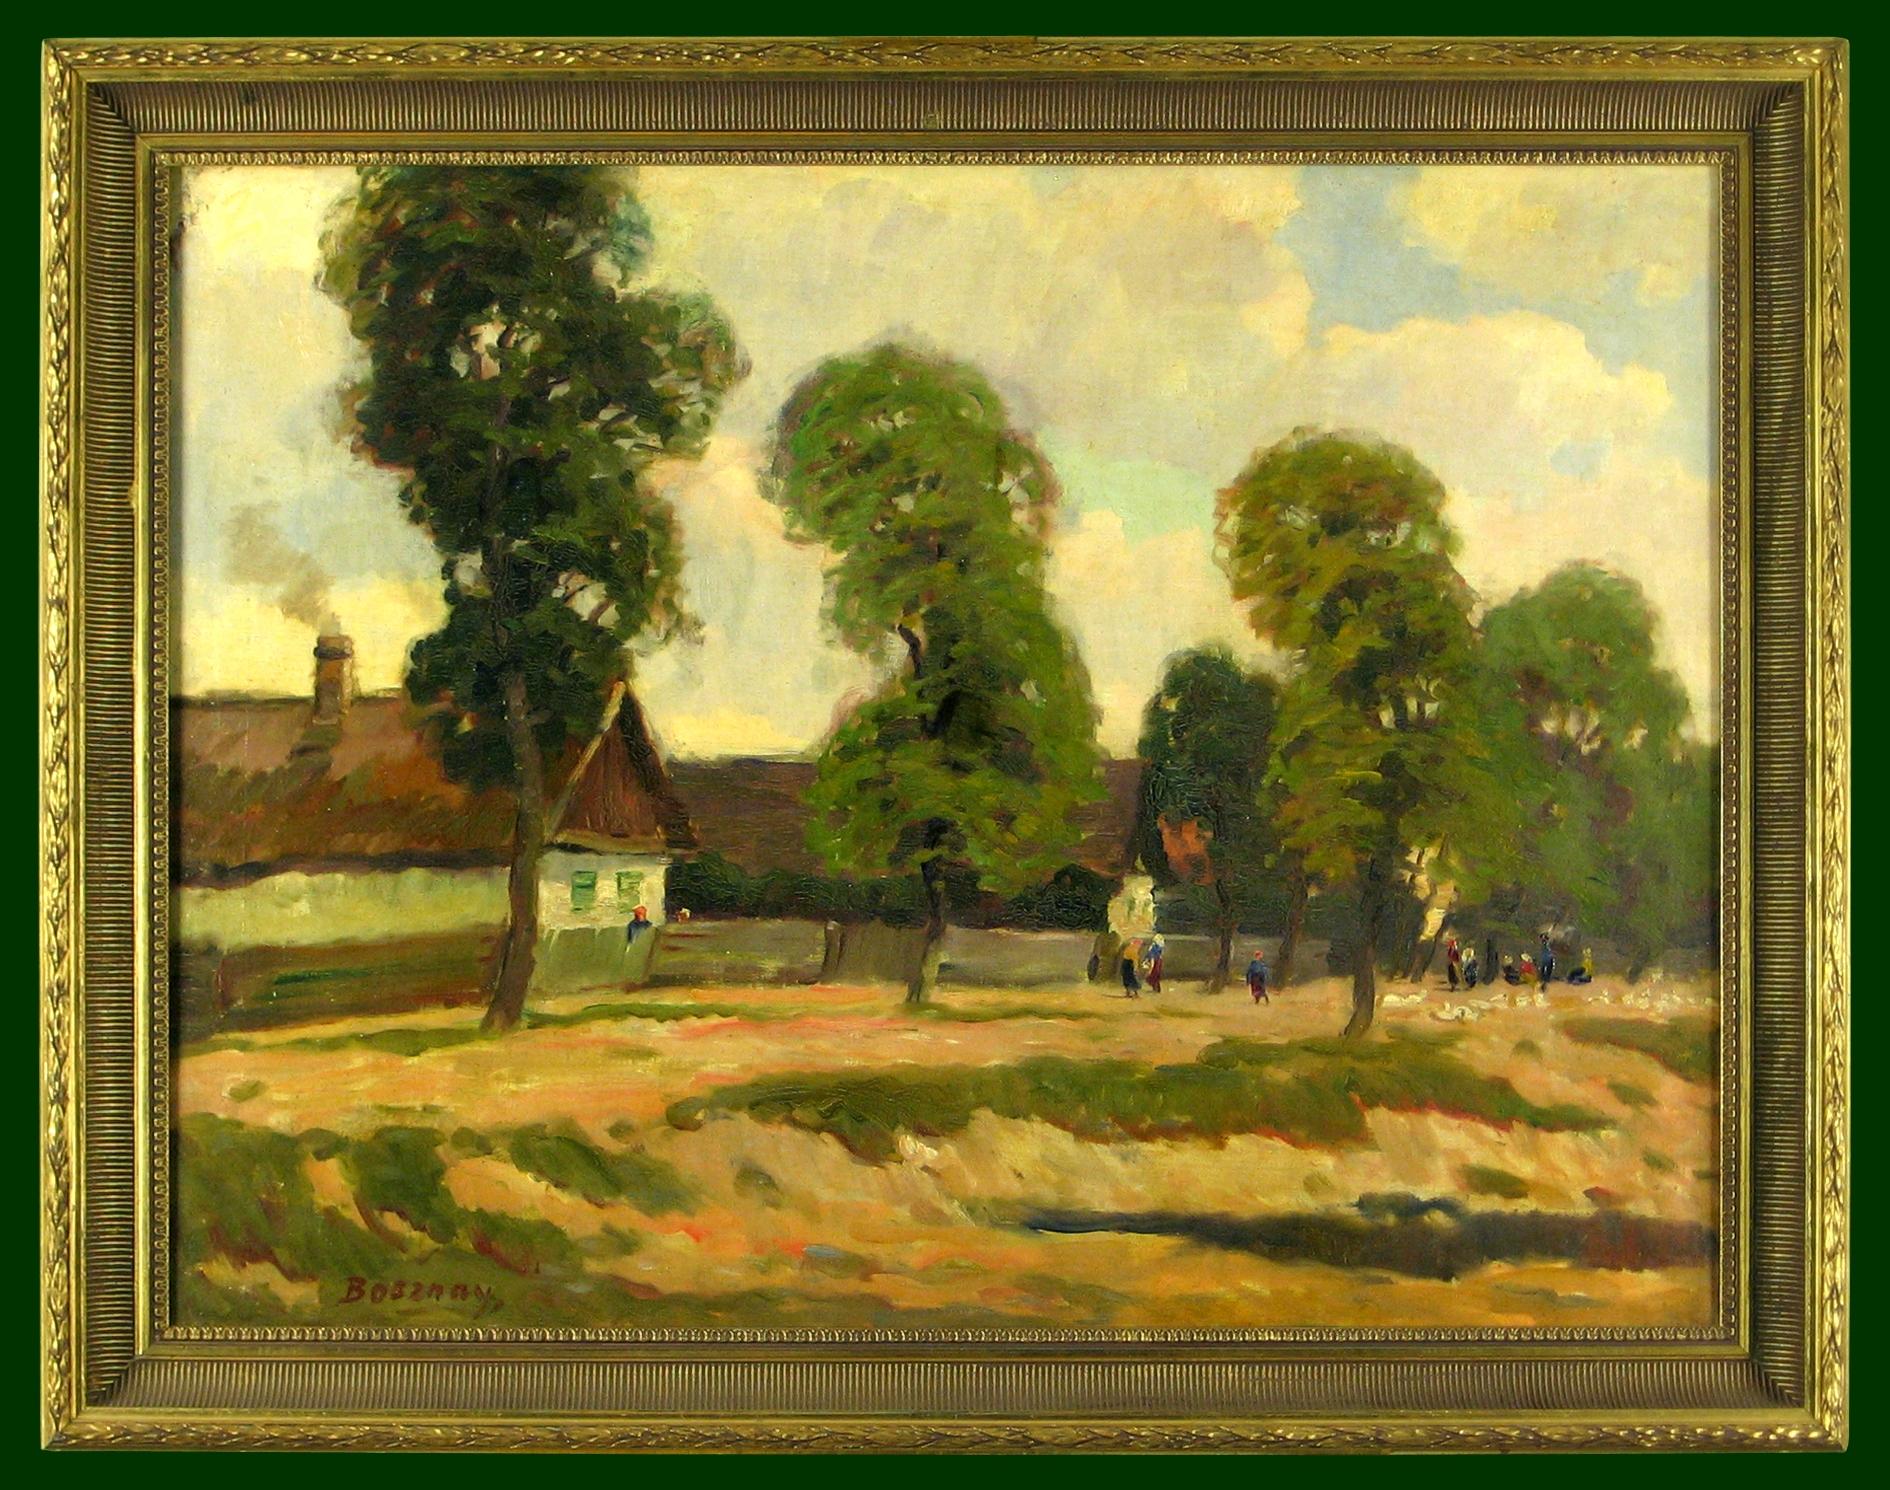 91-4k.jpg (1890×1490)